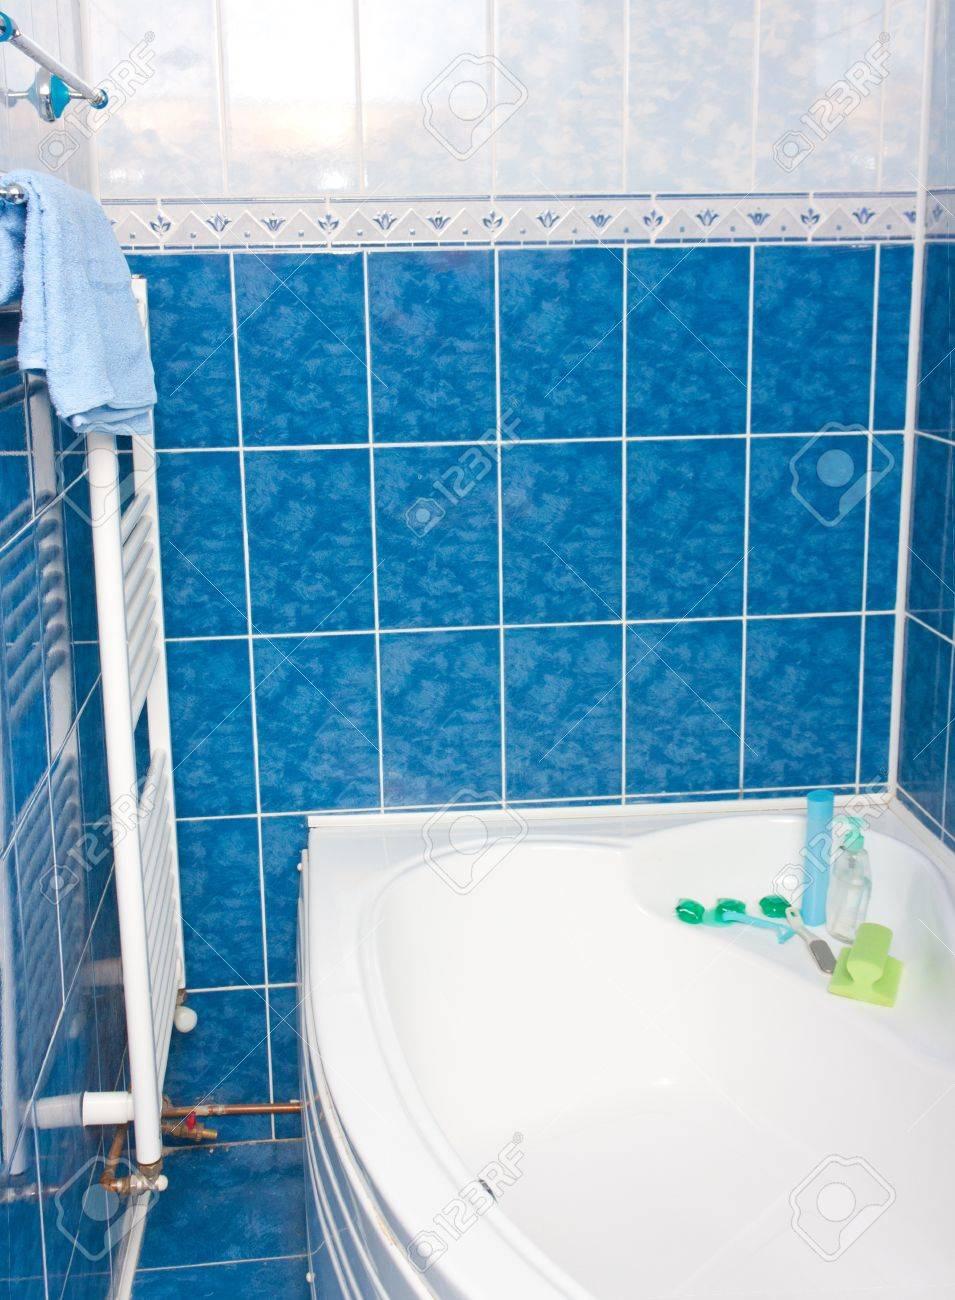 Modern bathroom with blue tiles,  bathtub and radiator Stock Photo - 9551376